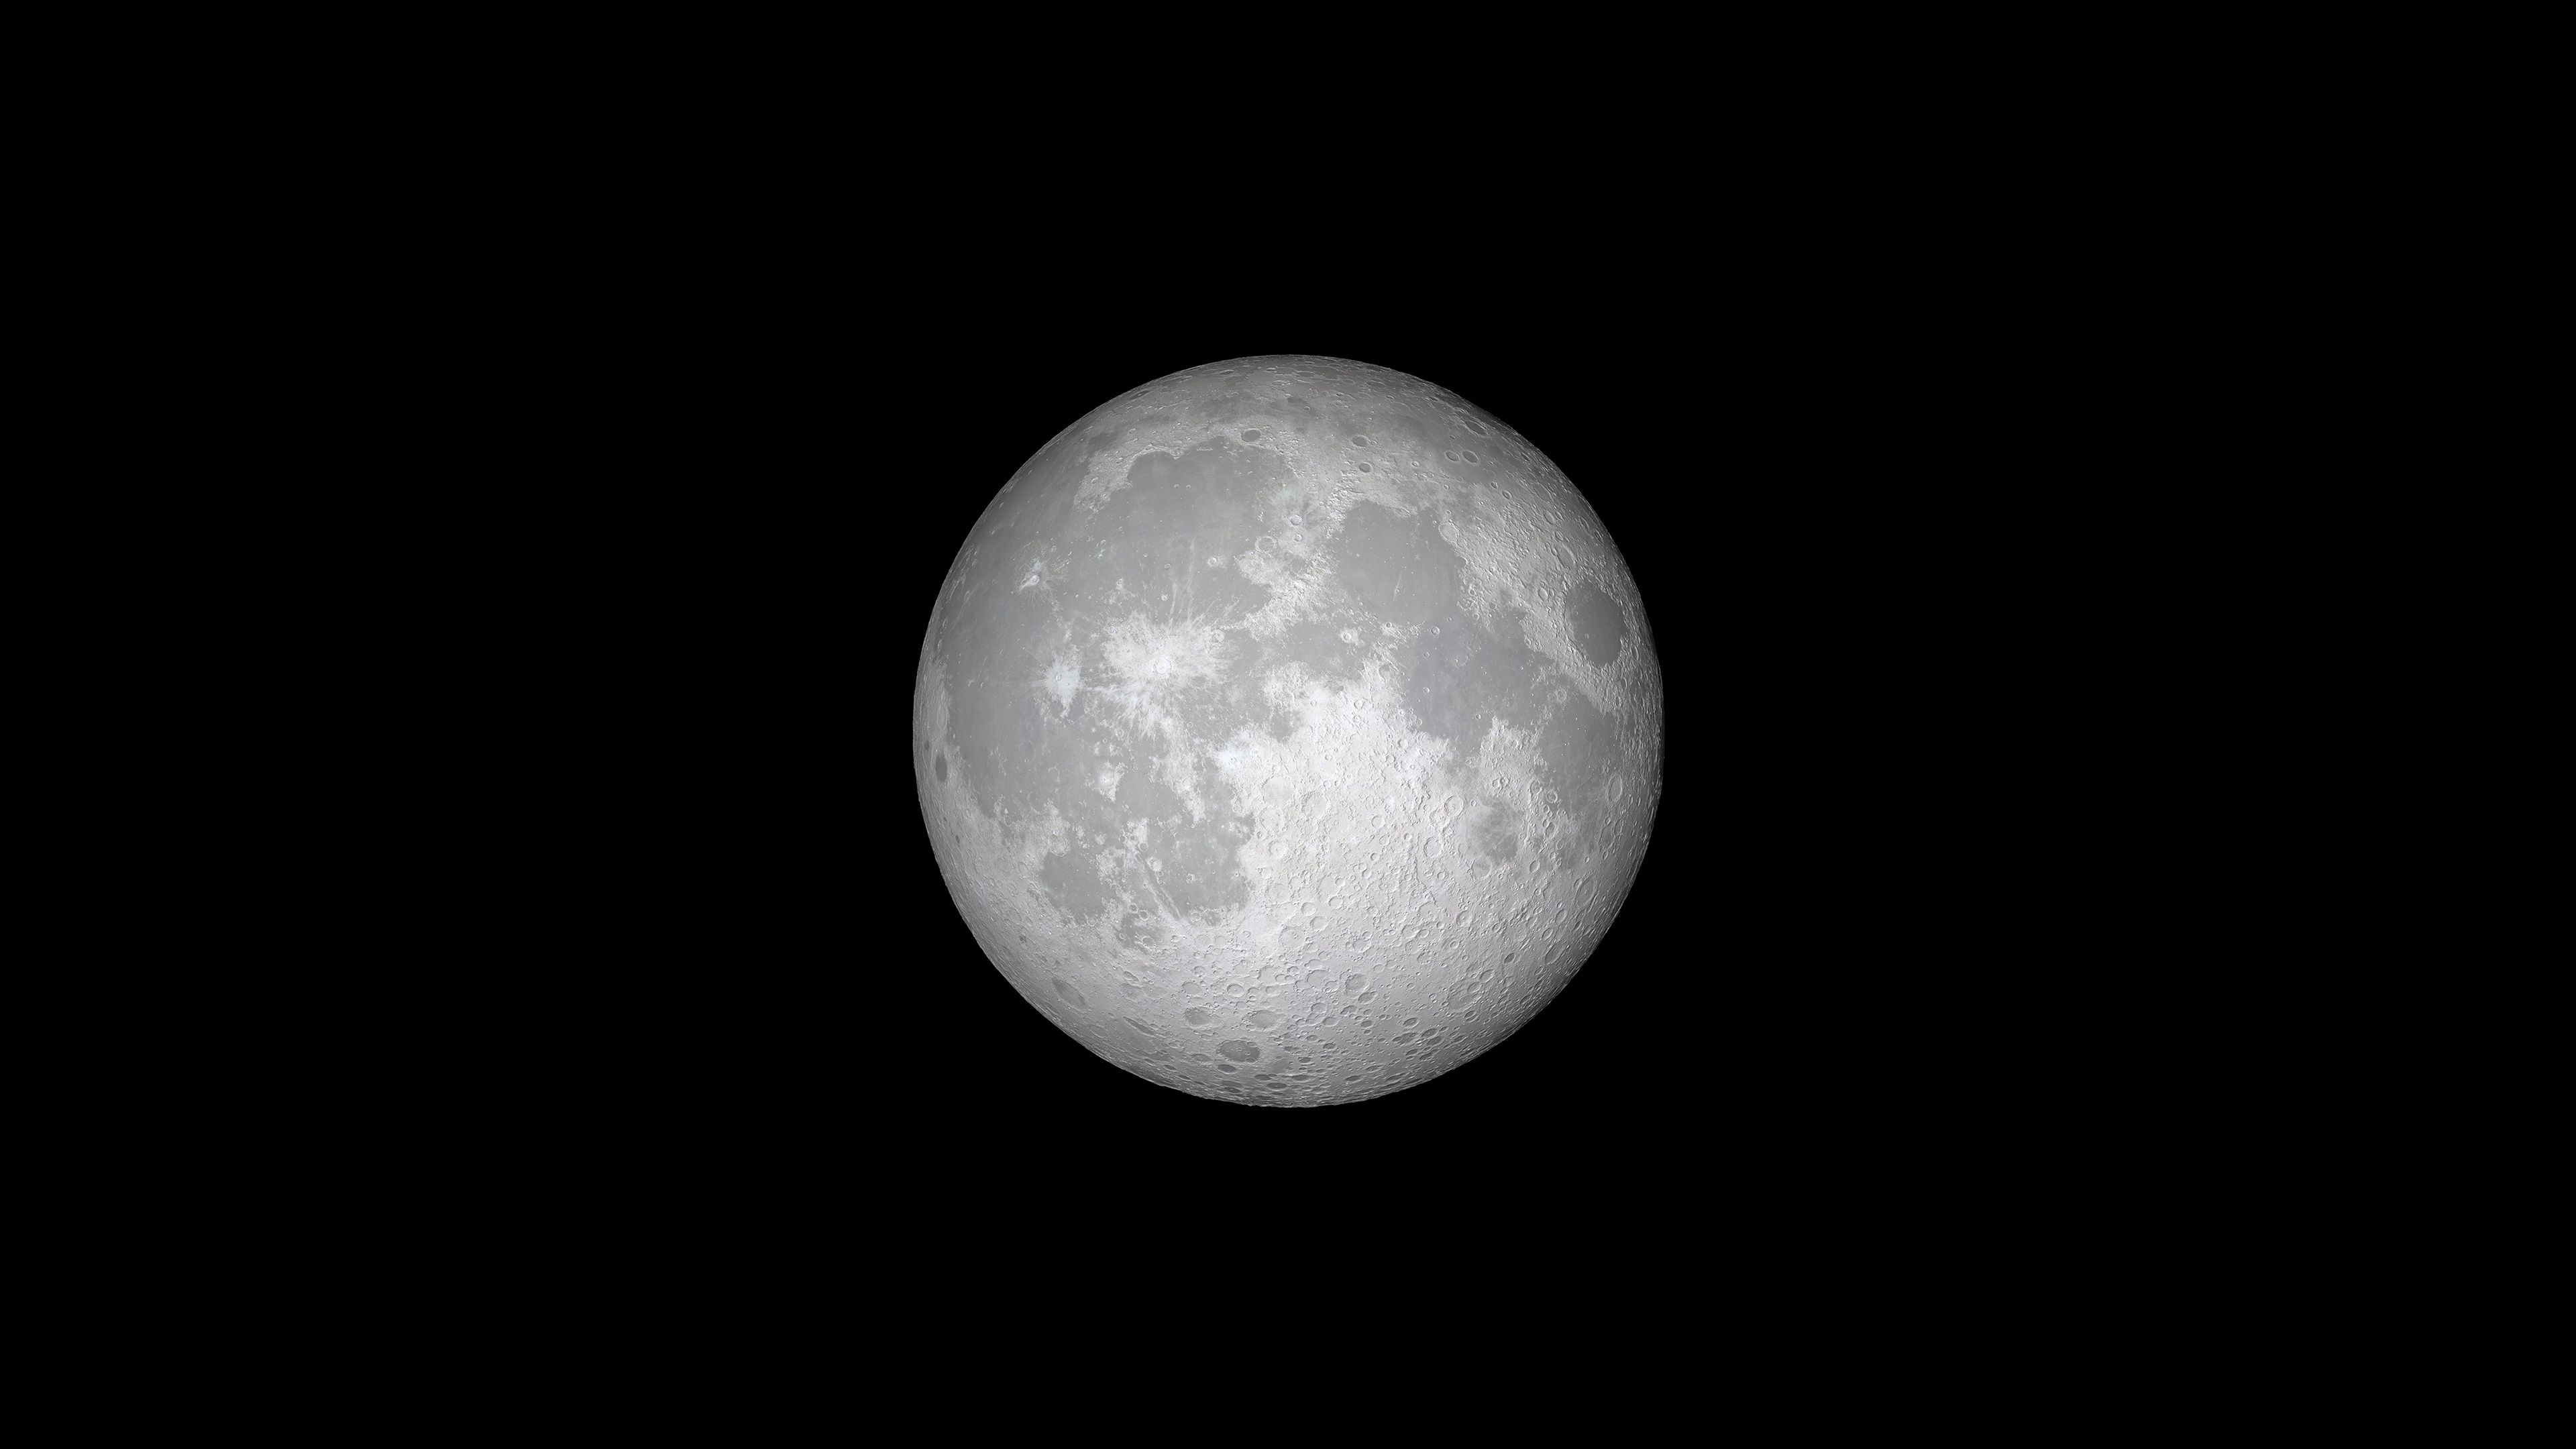 4K Moon Wallpapers   Top 4K Moon Backgrounds   WallpaperAccess 3840x2160